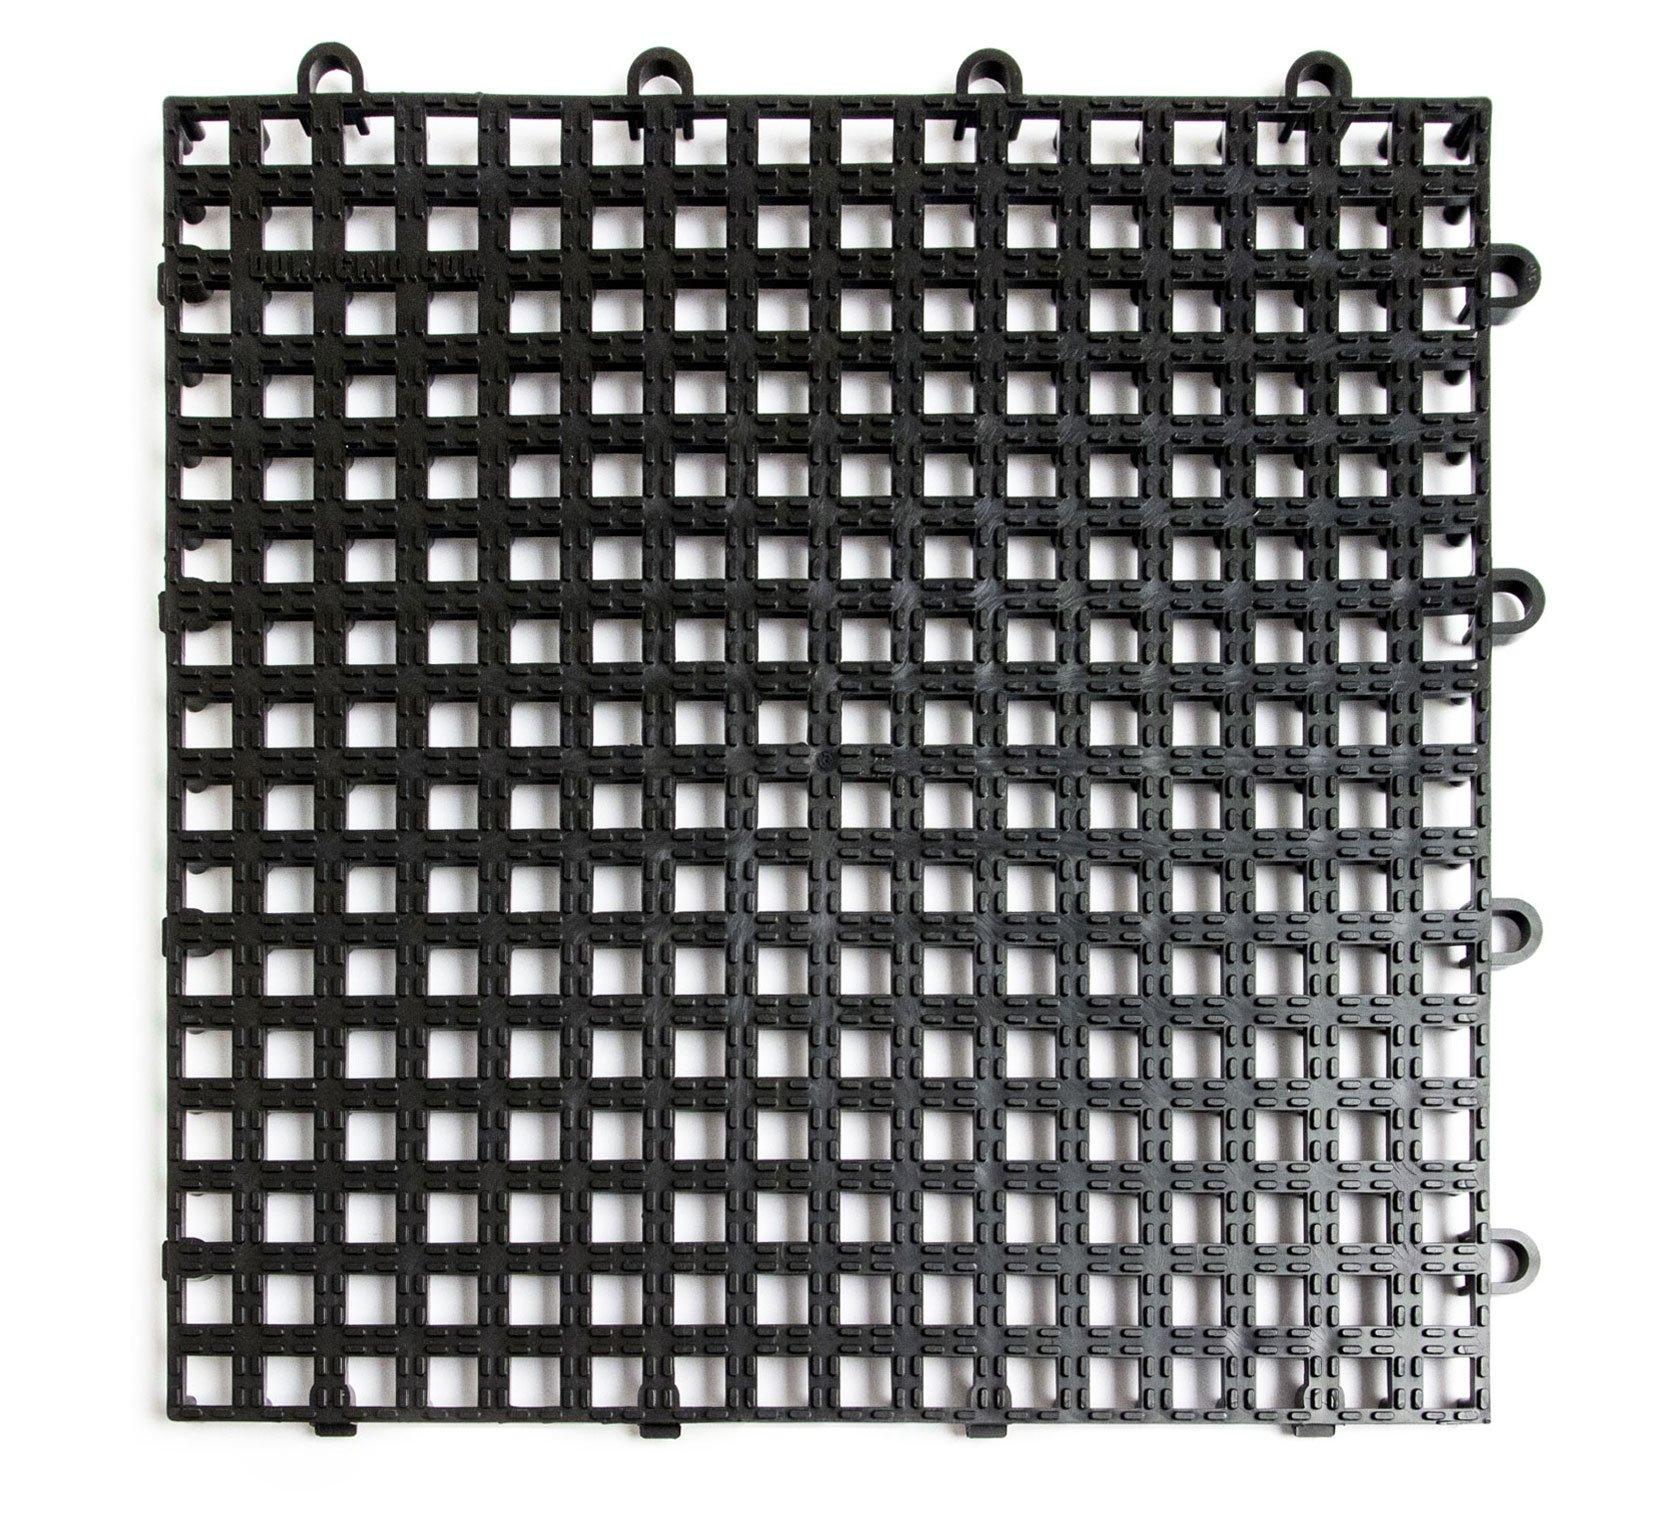 DuraGrid DNS12BLAK Non-Slip Interlocking Modular Multi-Use Safety Floor Matting (12 Pack), Black